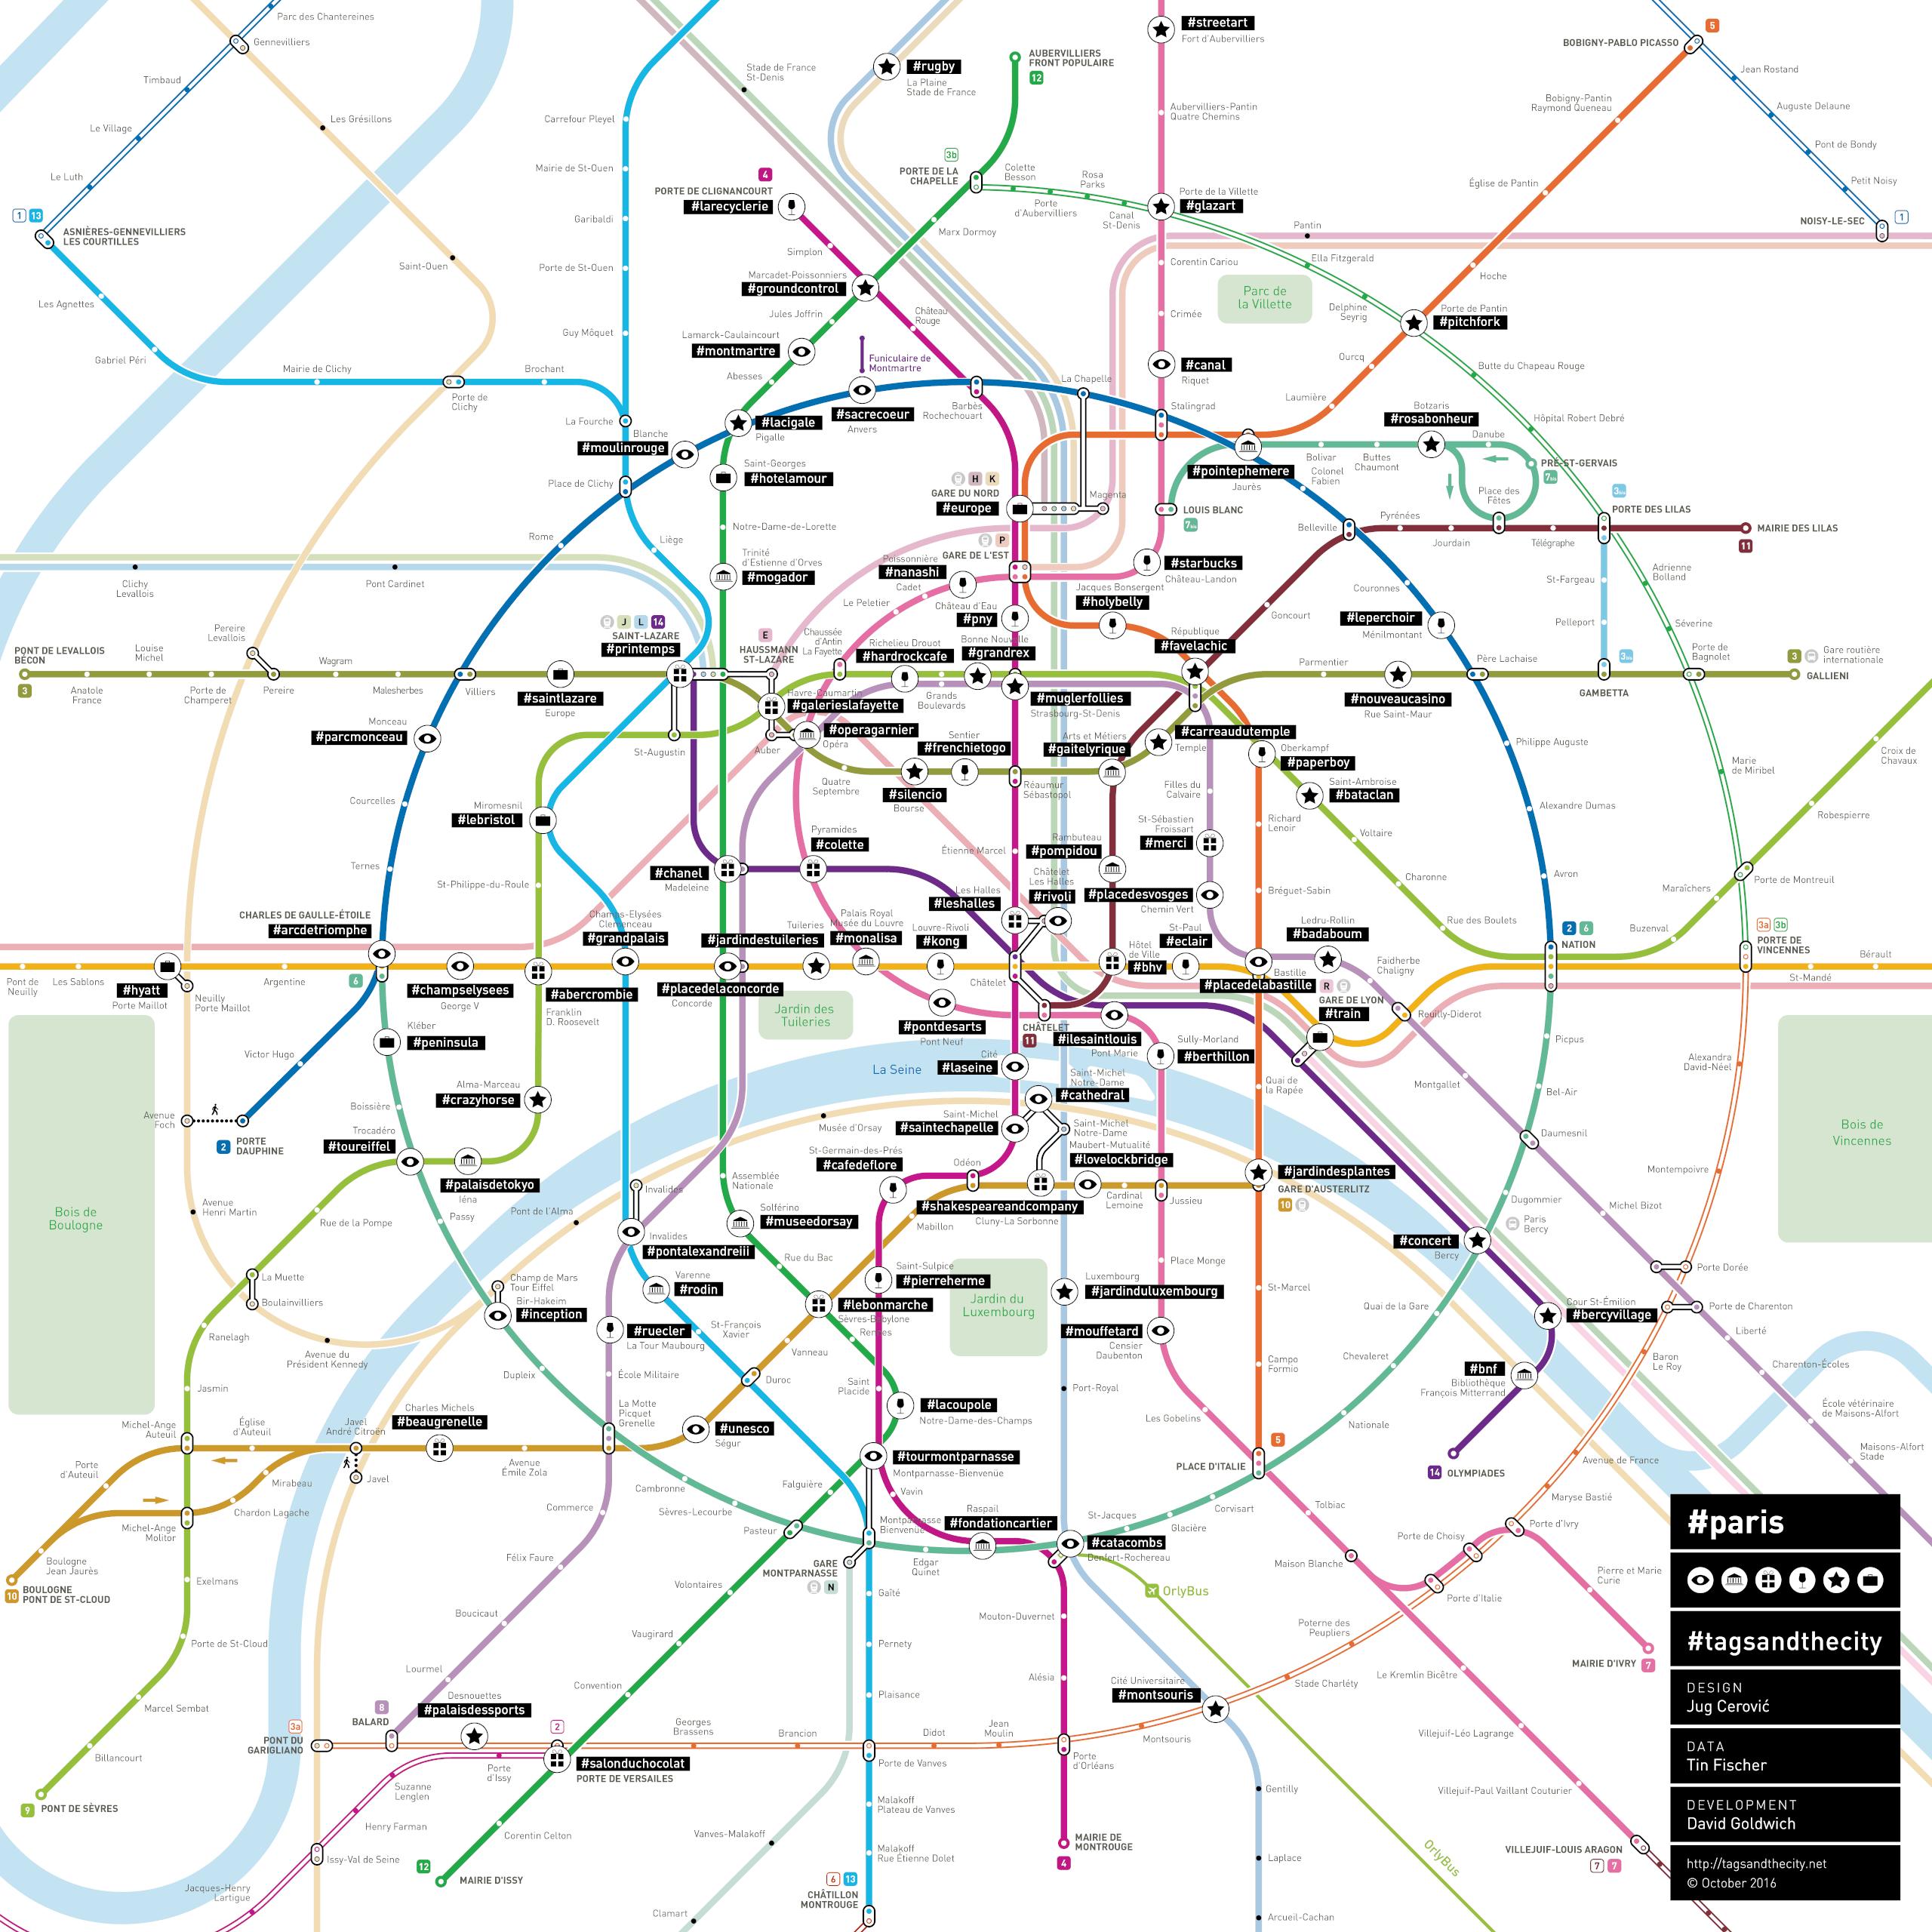 tagsandthecity – Paris